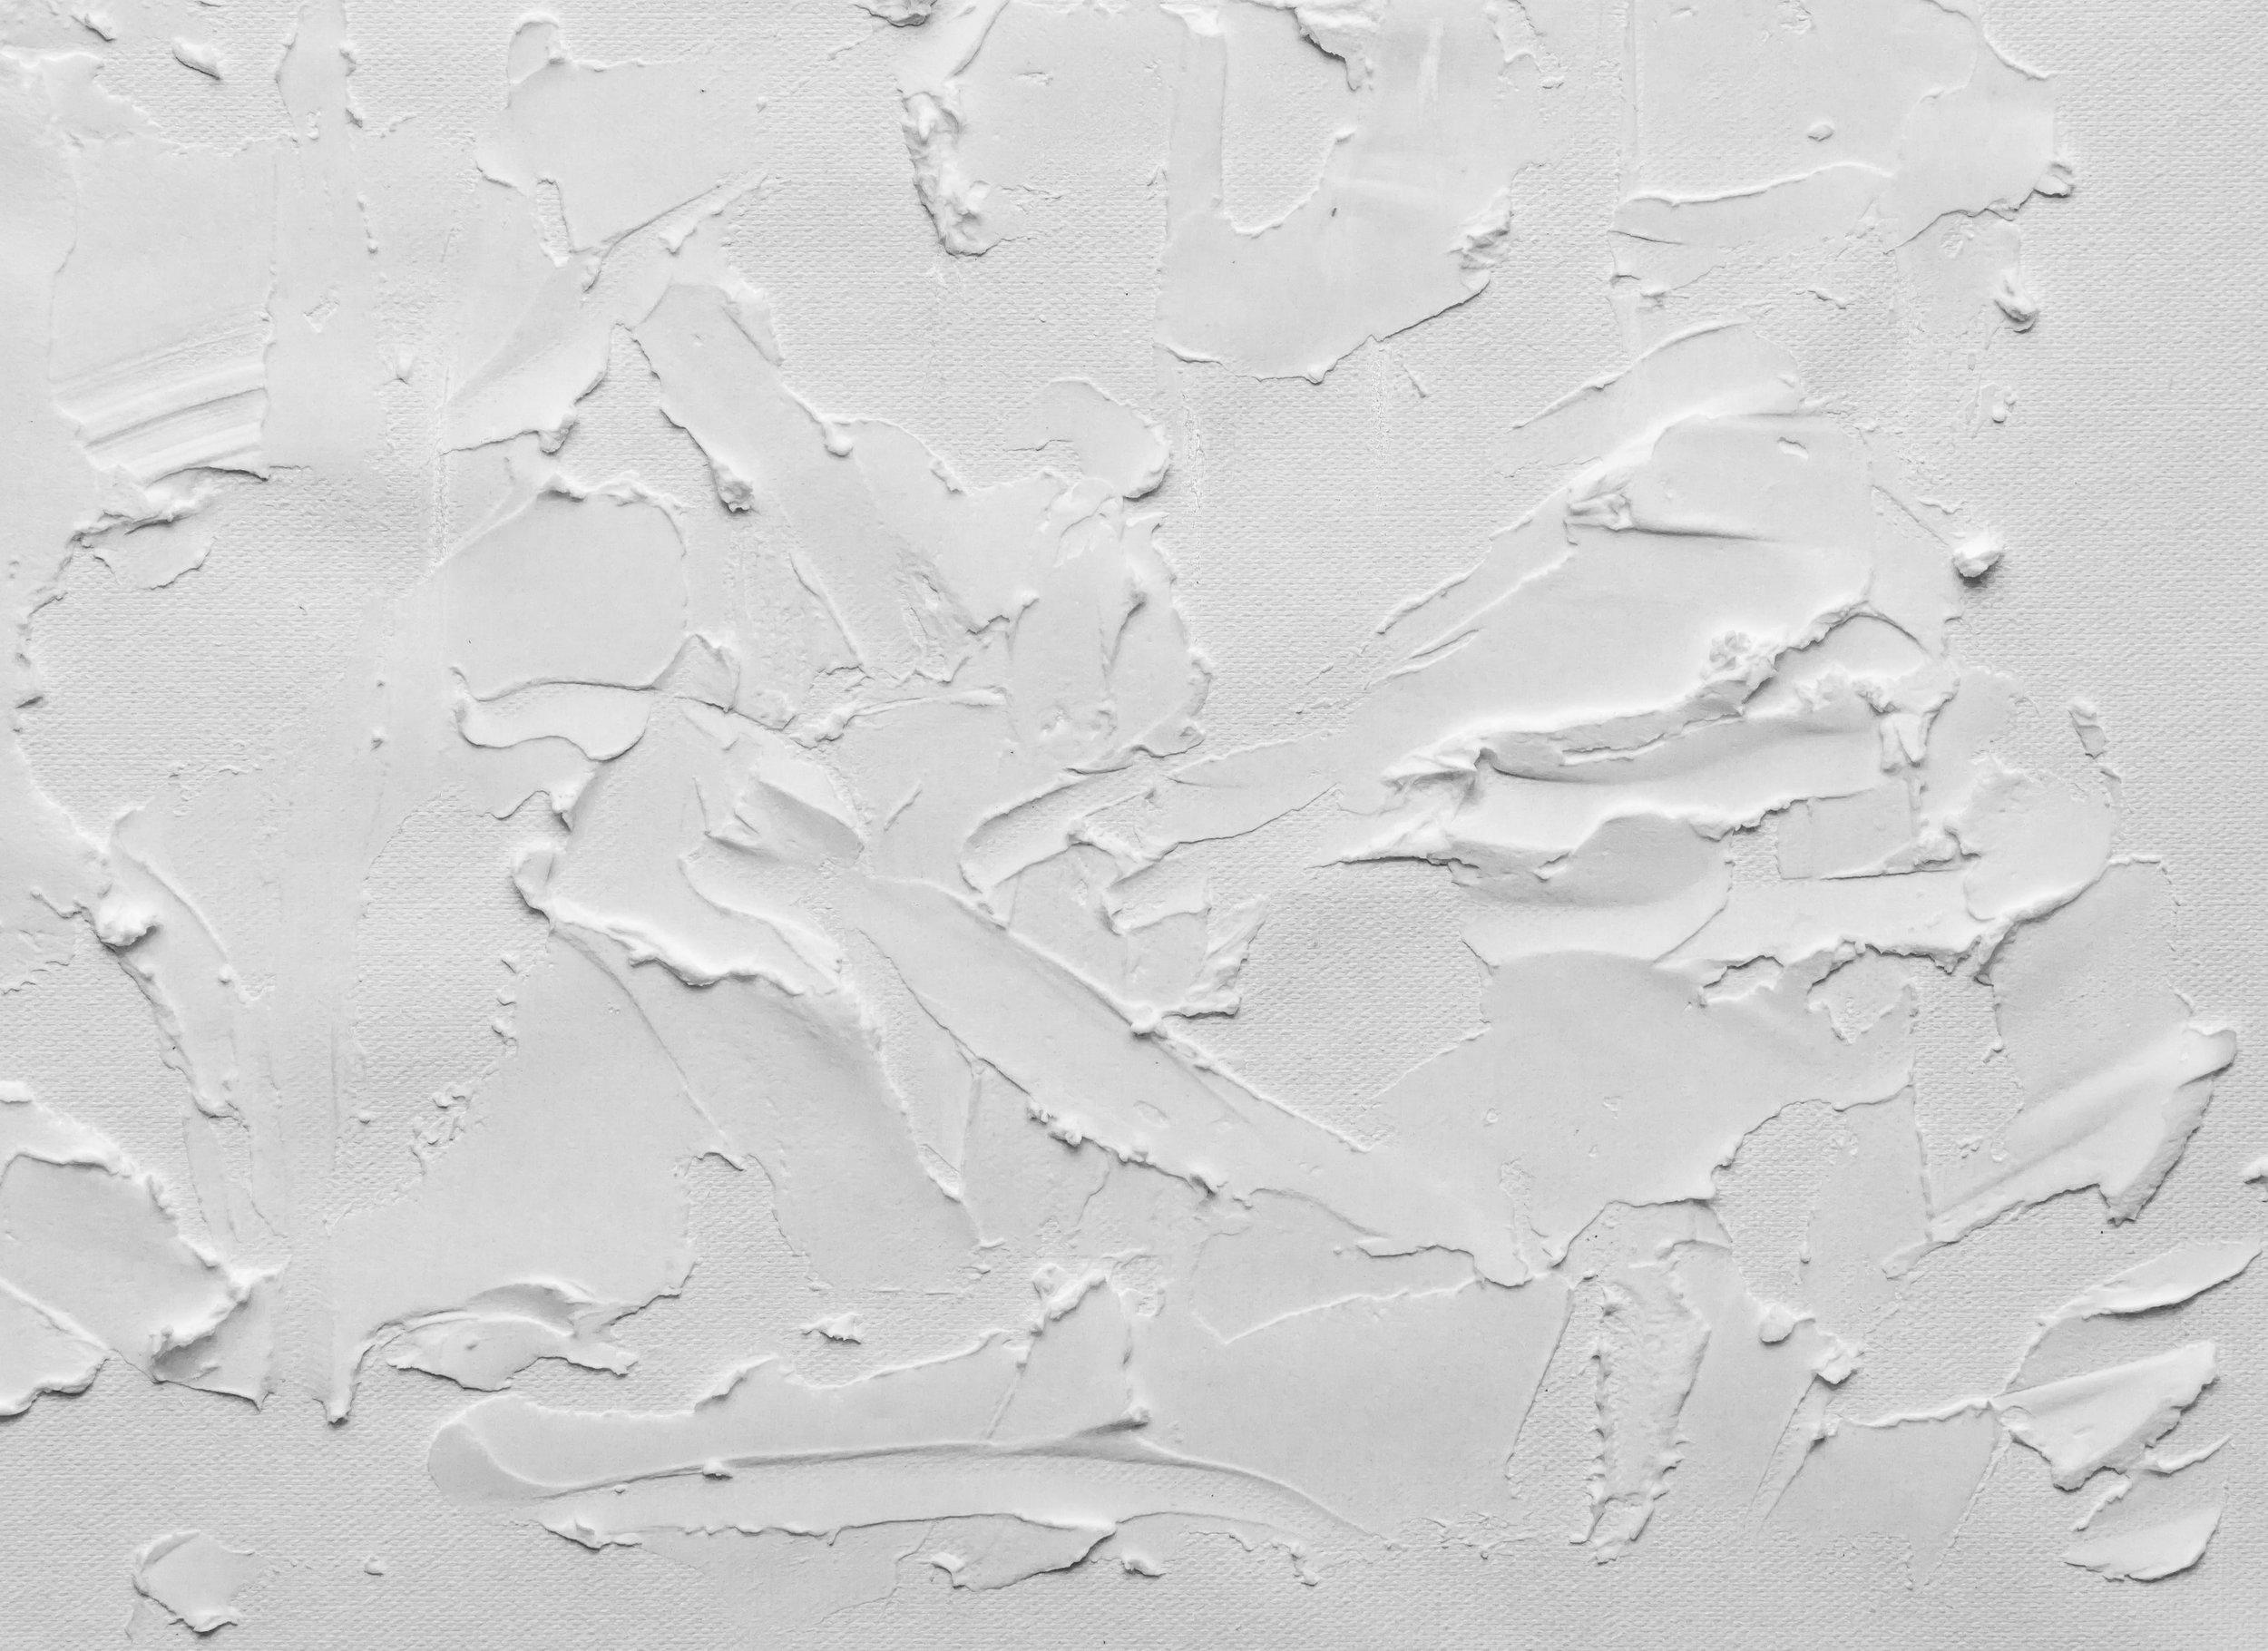 abstract-art-background-1484759.jpg